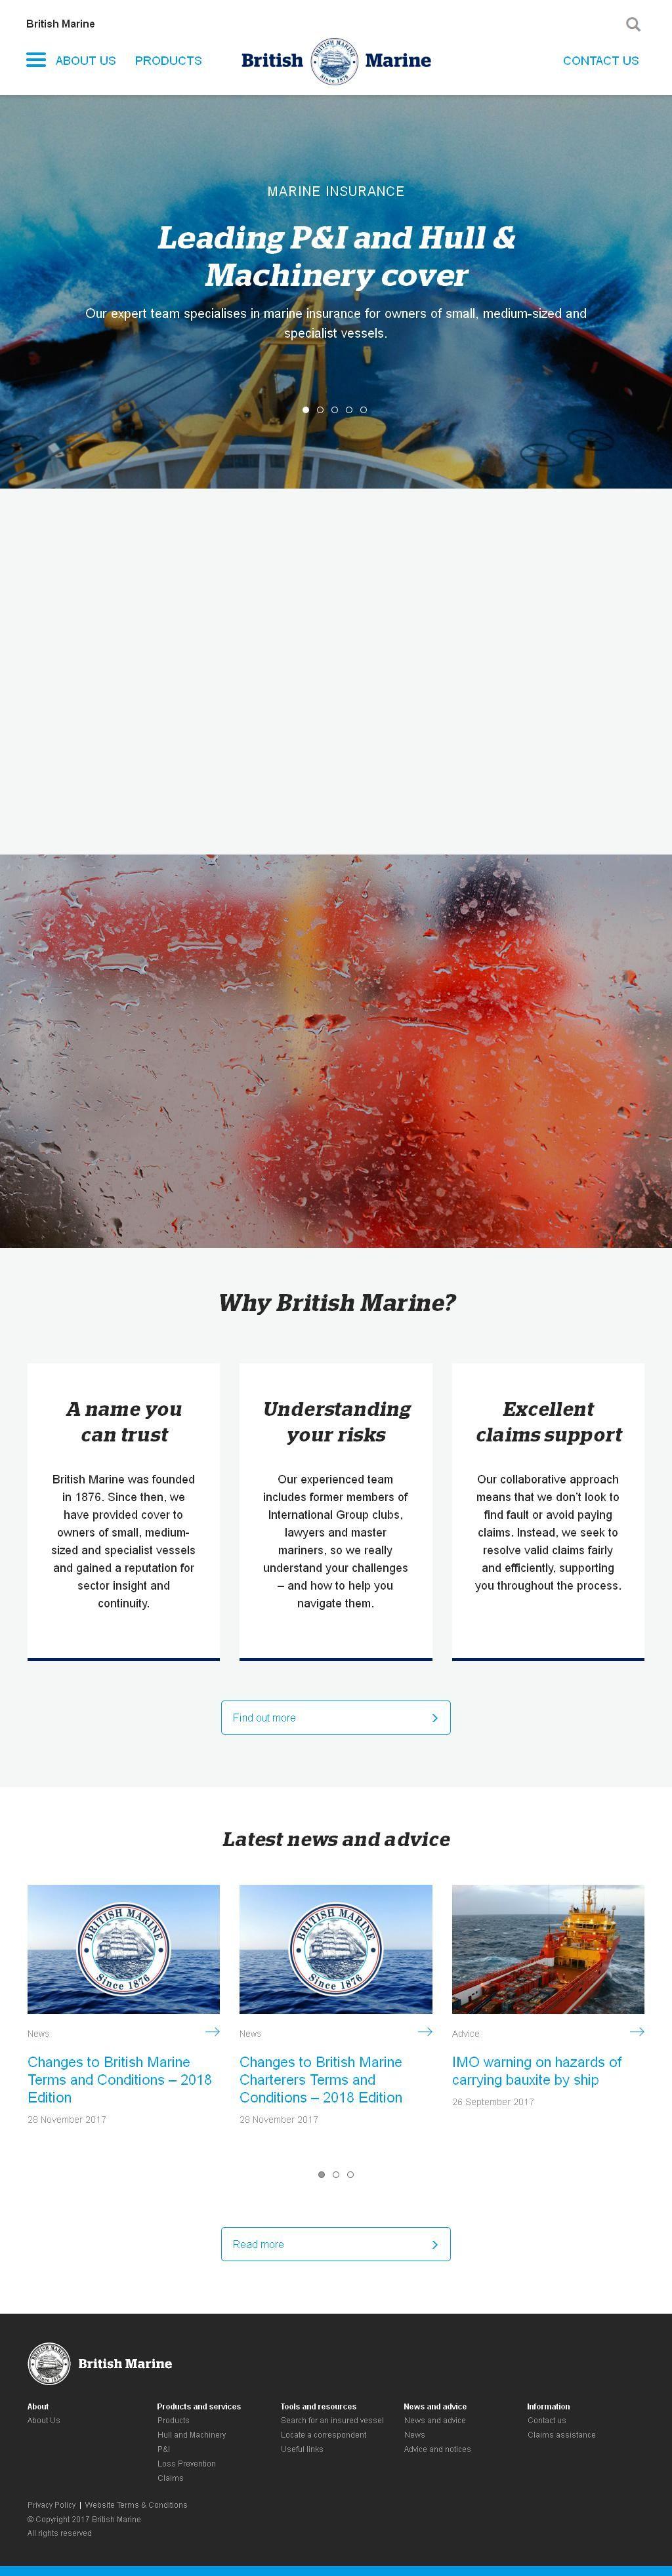 British Marine Managers Ltd Insurance Services Suite 12